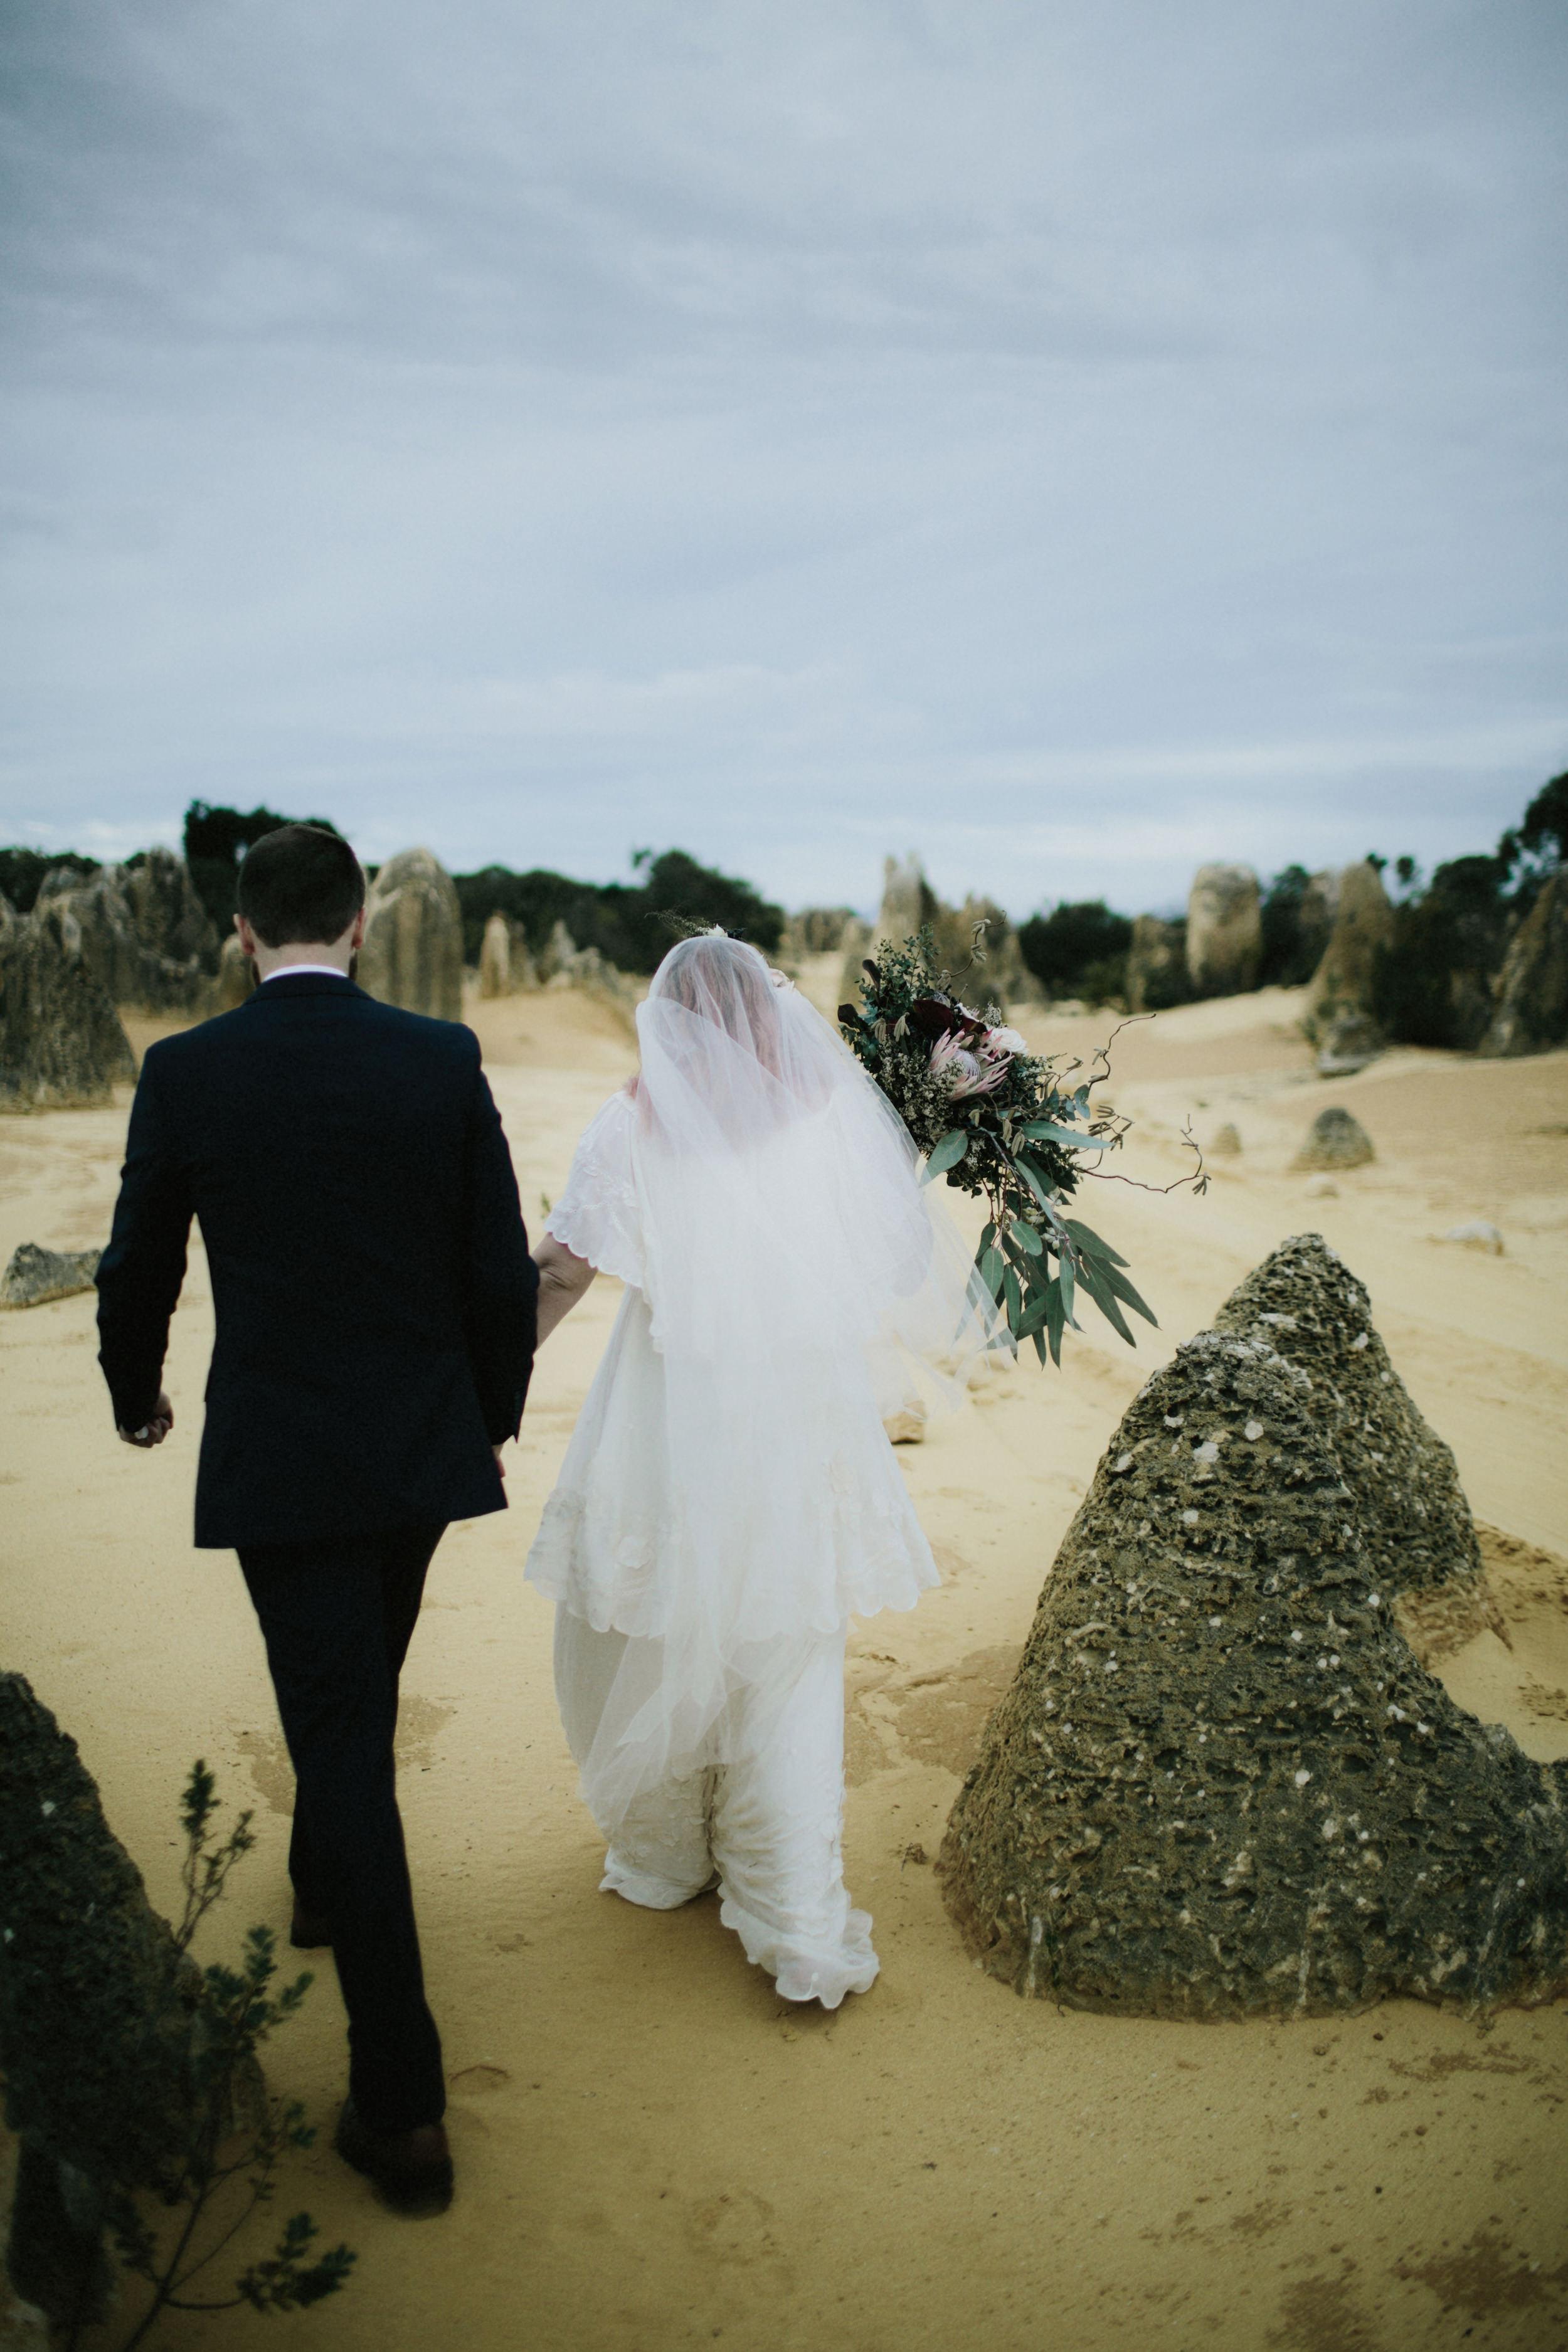 I-Got-You-Babe-Weddings-Hannah-Brent-Anniversary0031.JPG